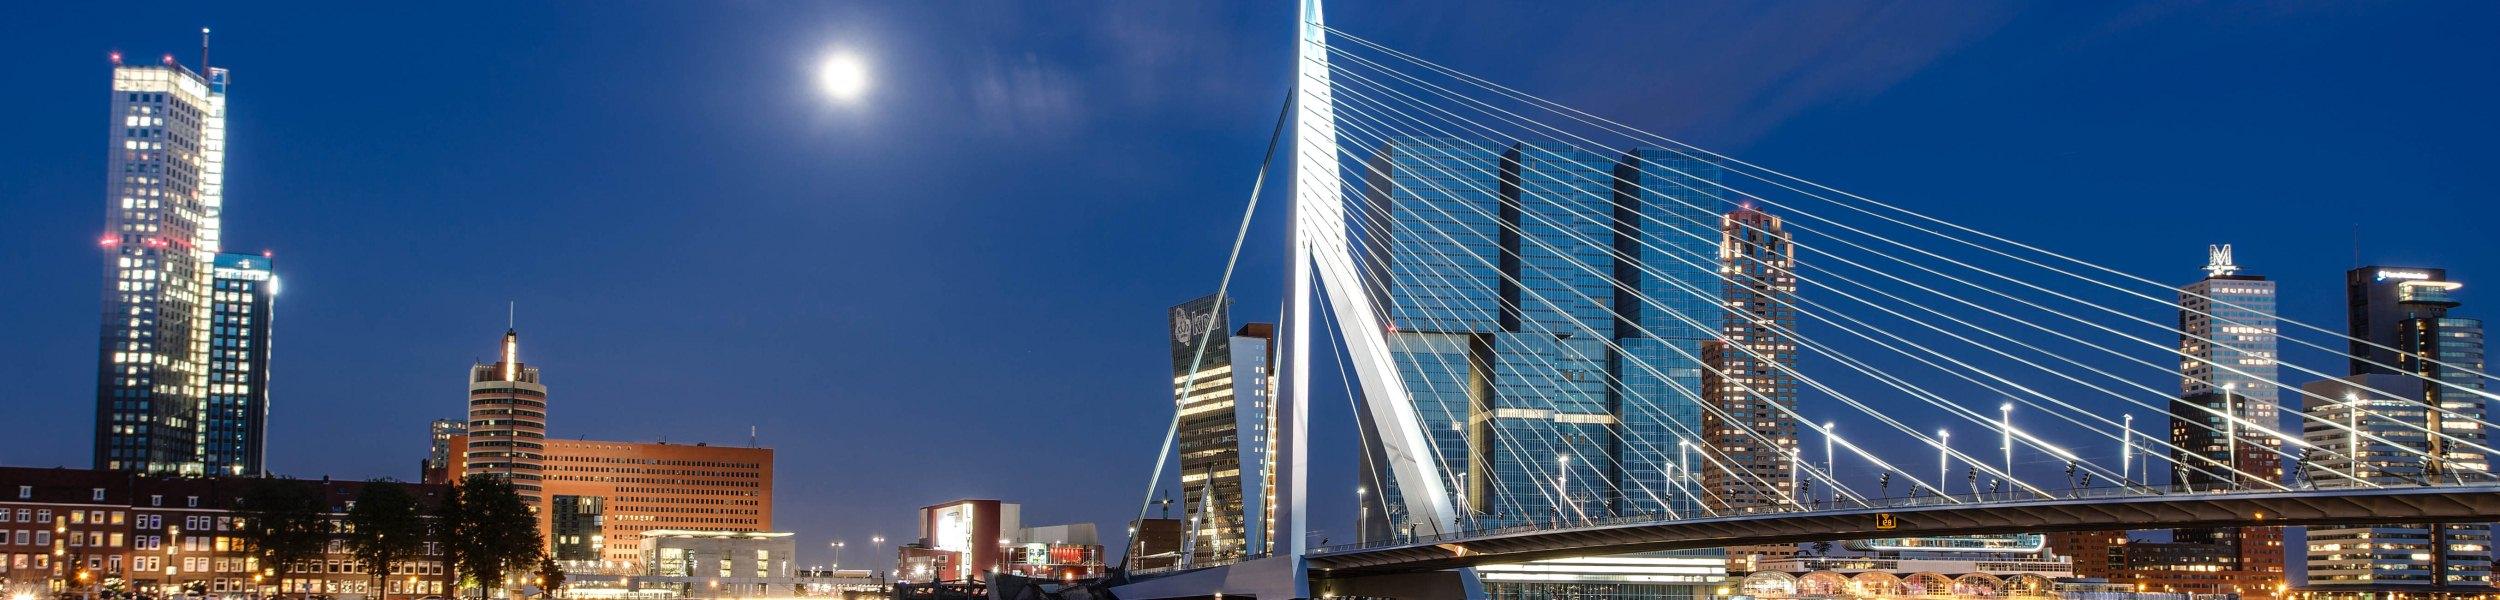 Software Engineer (WPF) Rotterdam, the Netherlands